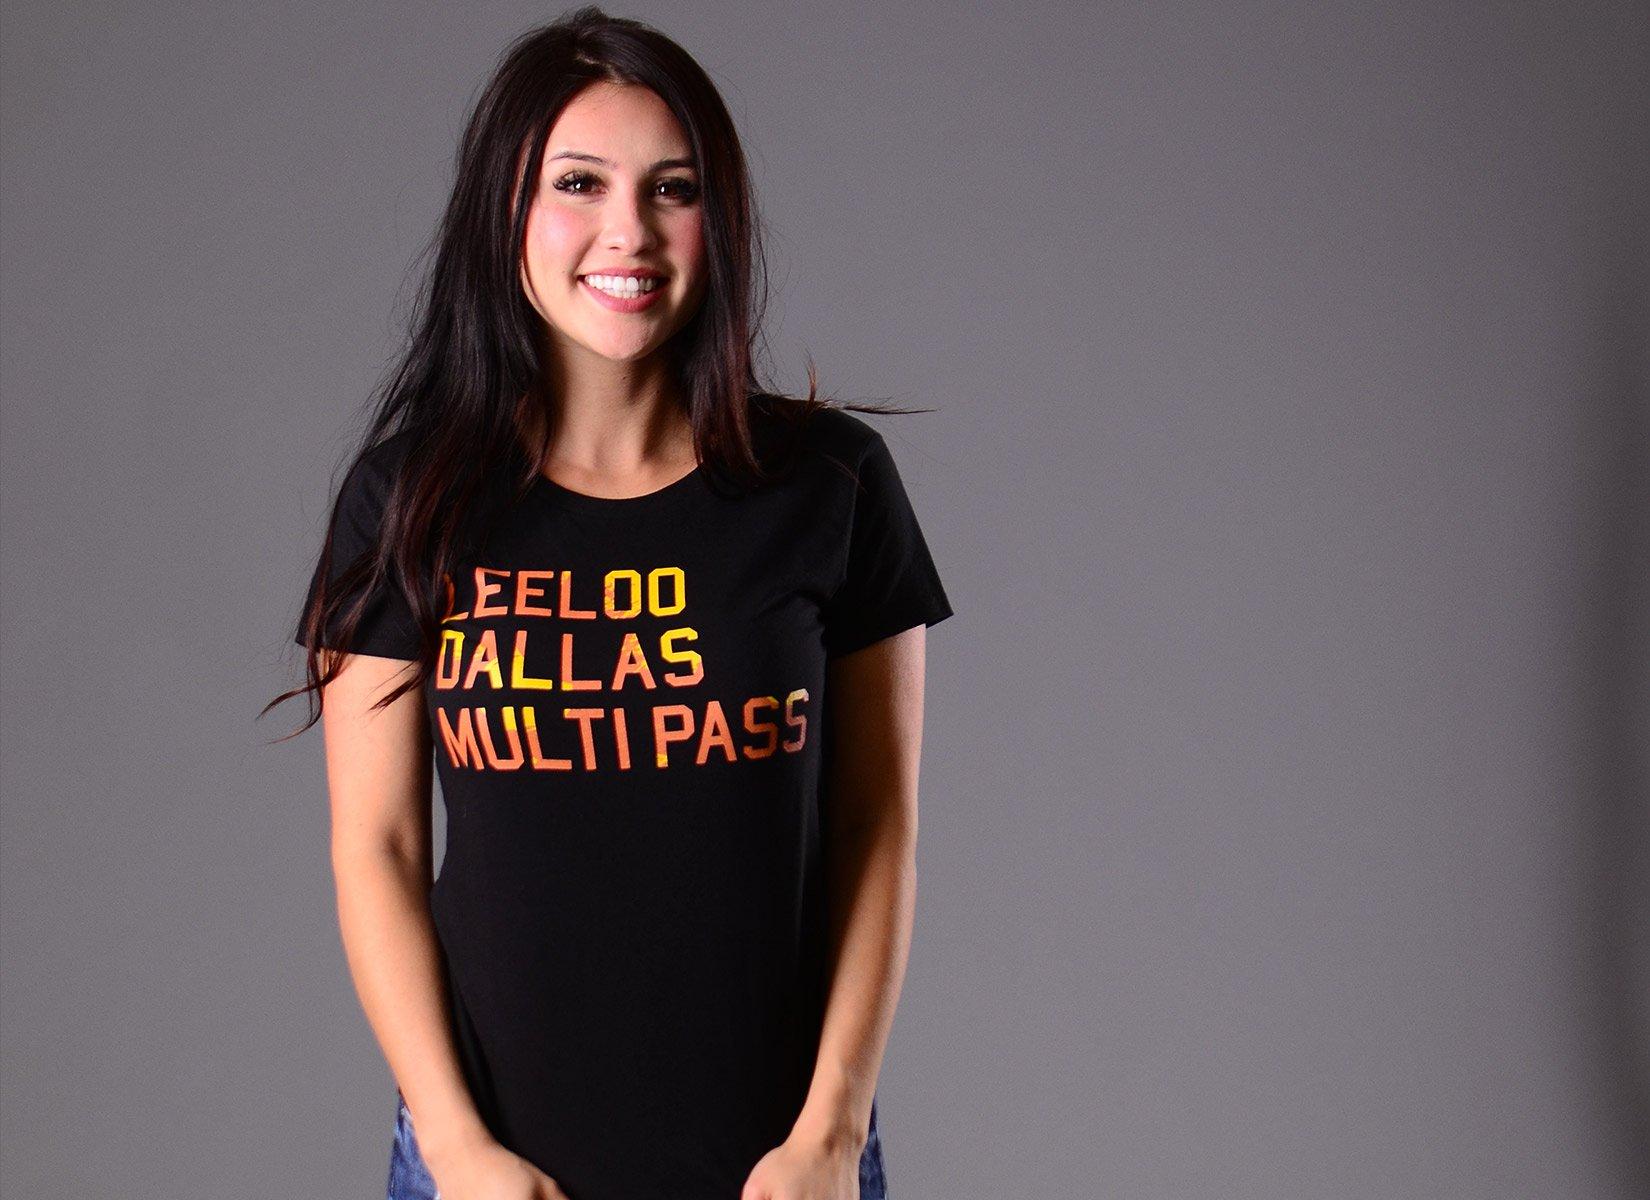 Leeloo Dallas Multipass on Womens T-Shirt